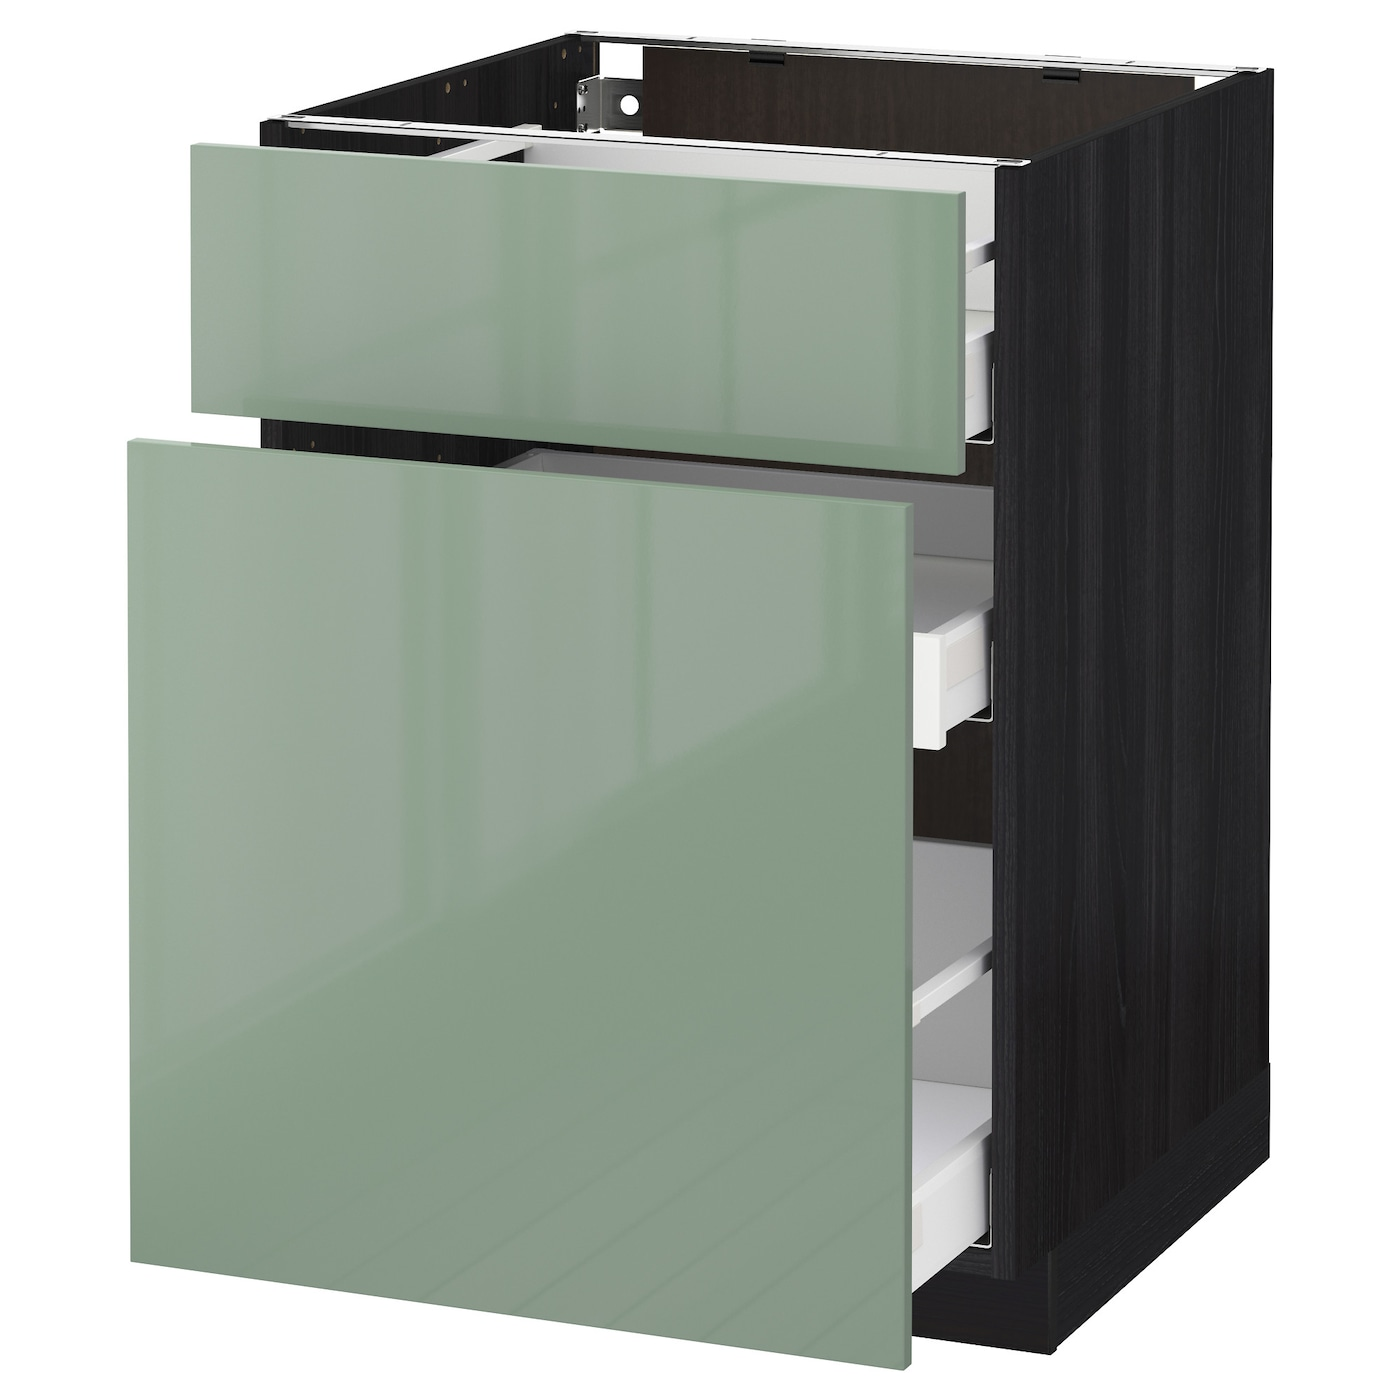 Metod maximera base cabinet p out storage drawer black kallarp light green 60x60 cm ikea - Green kitchen cabinets storage ...